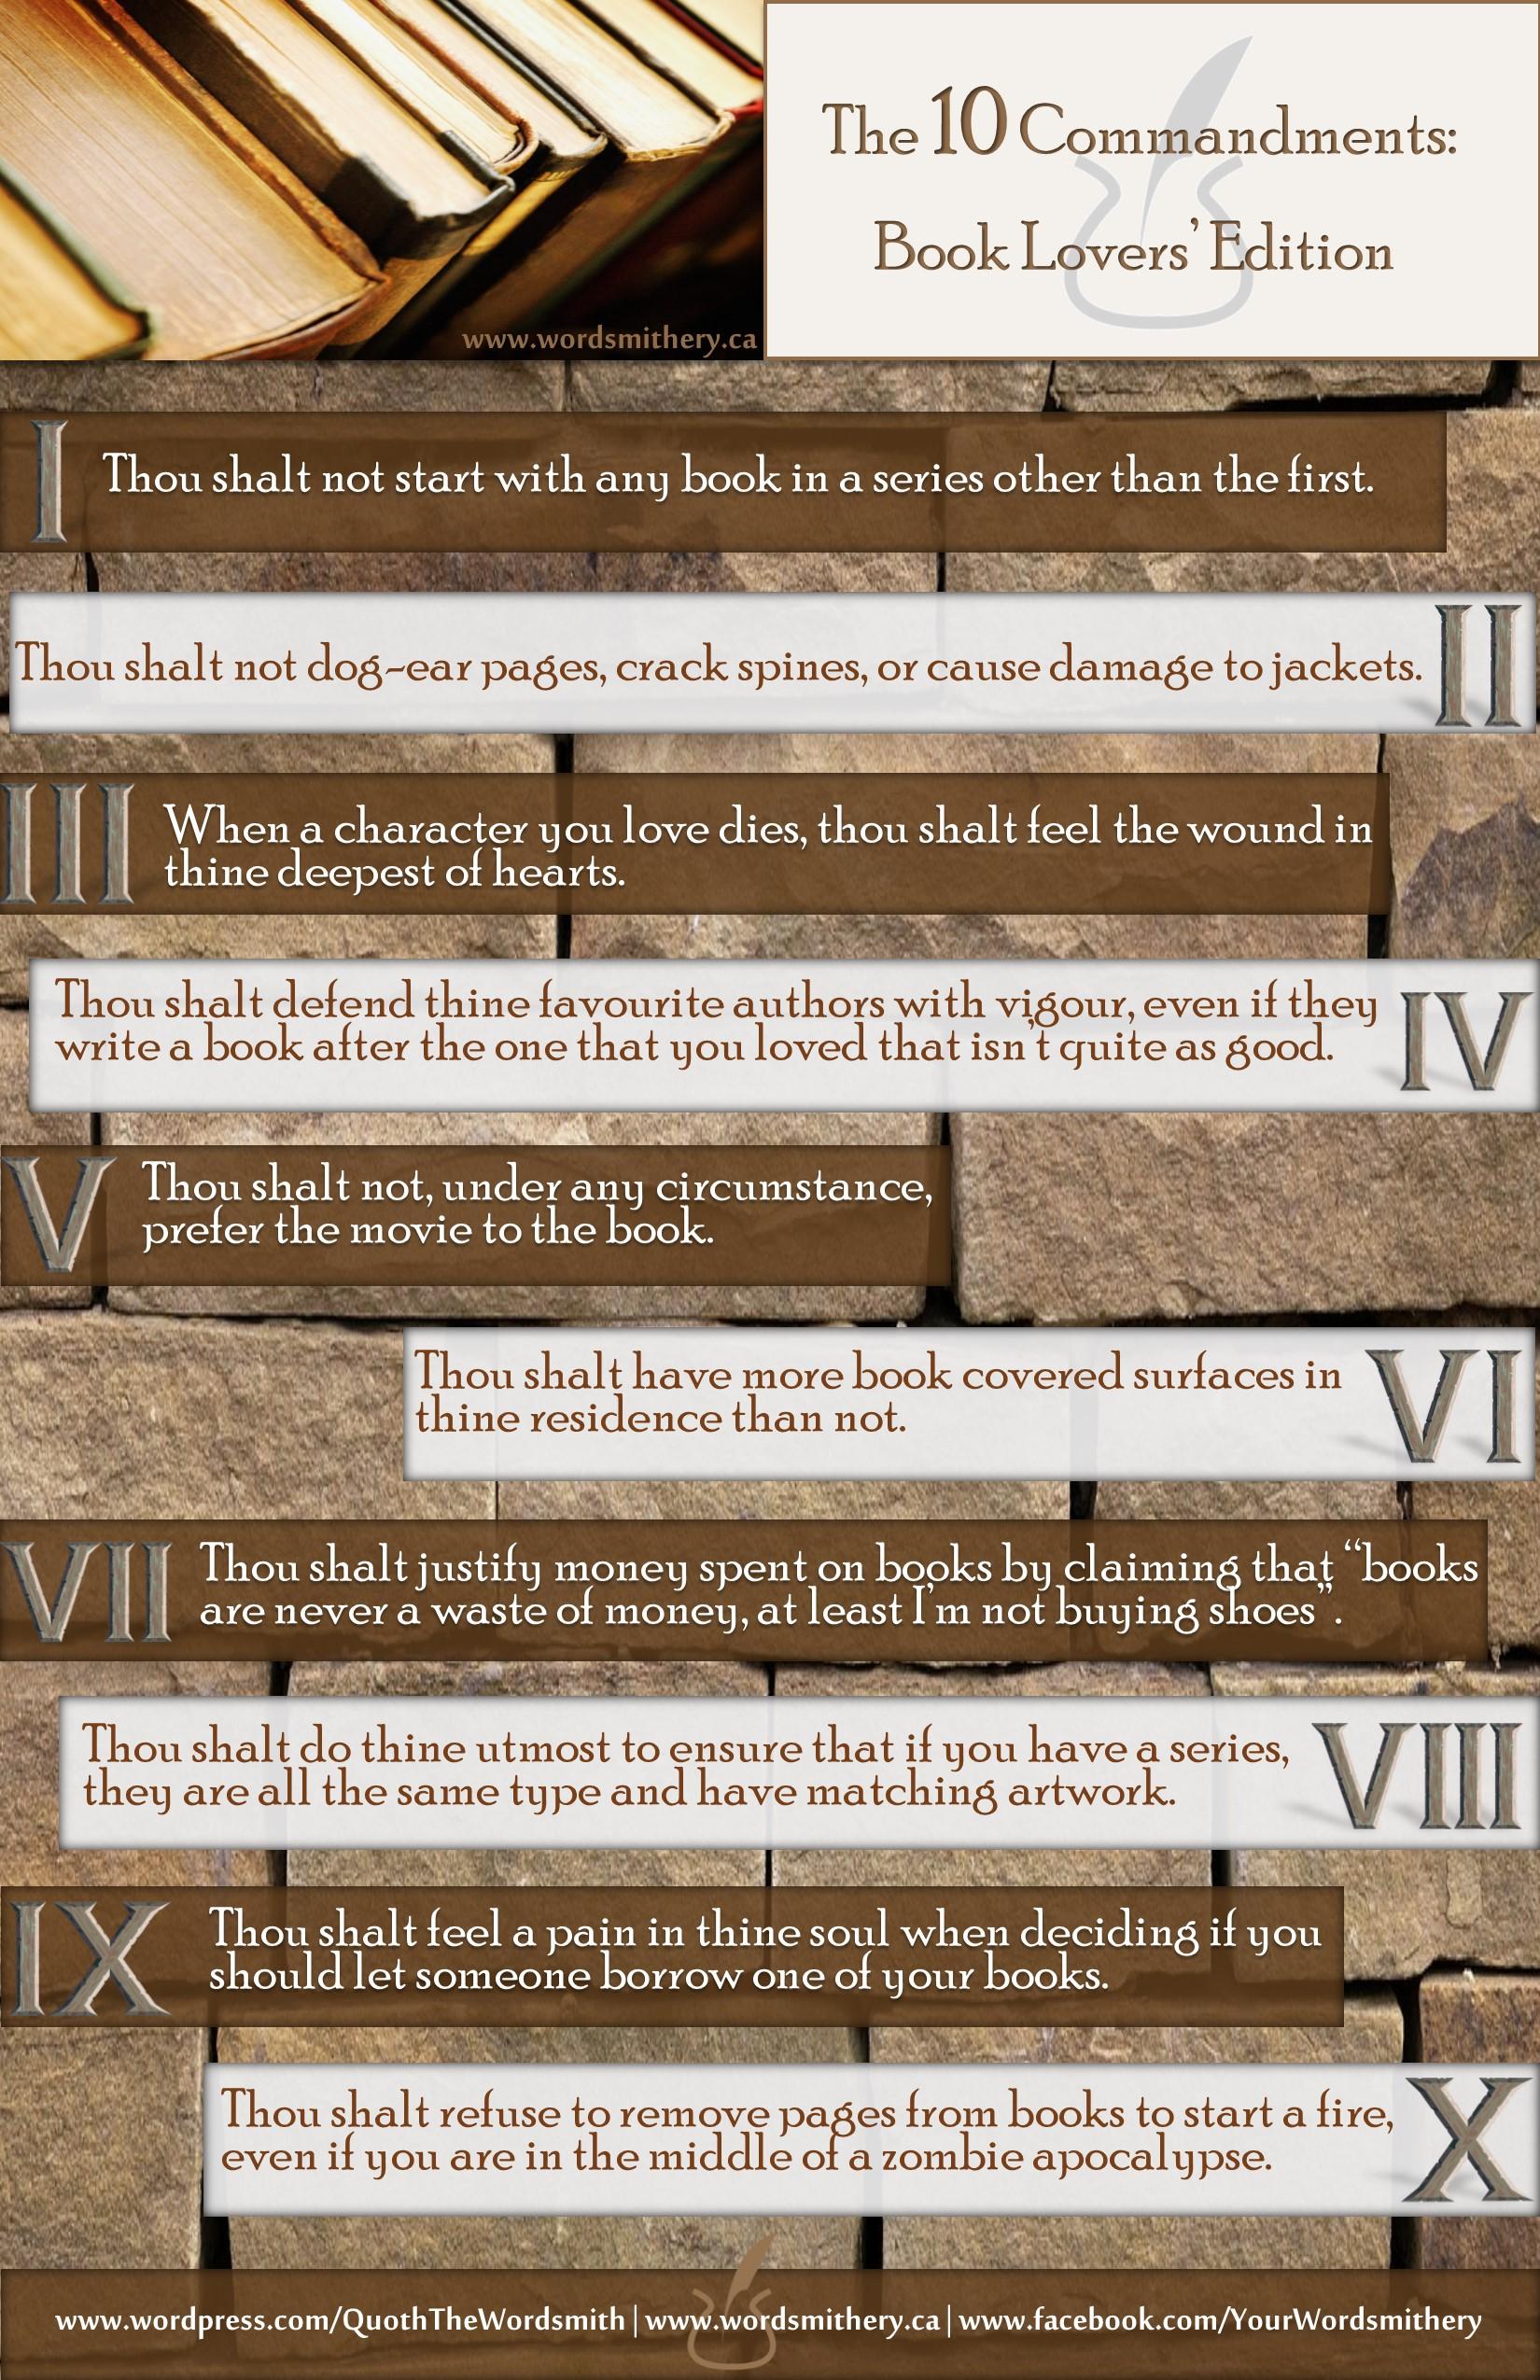 10 Commandments: Book Lovers' Edition